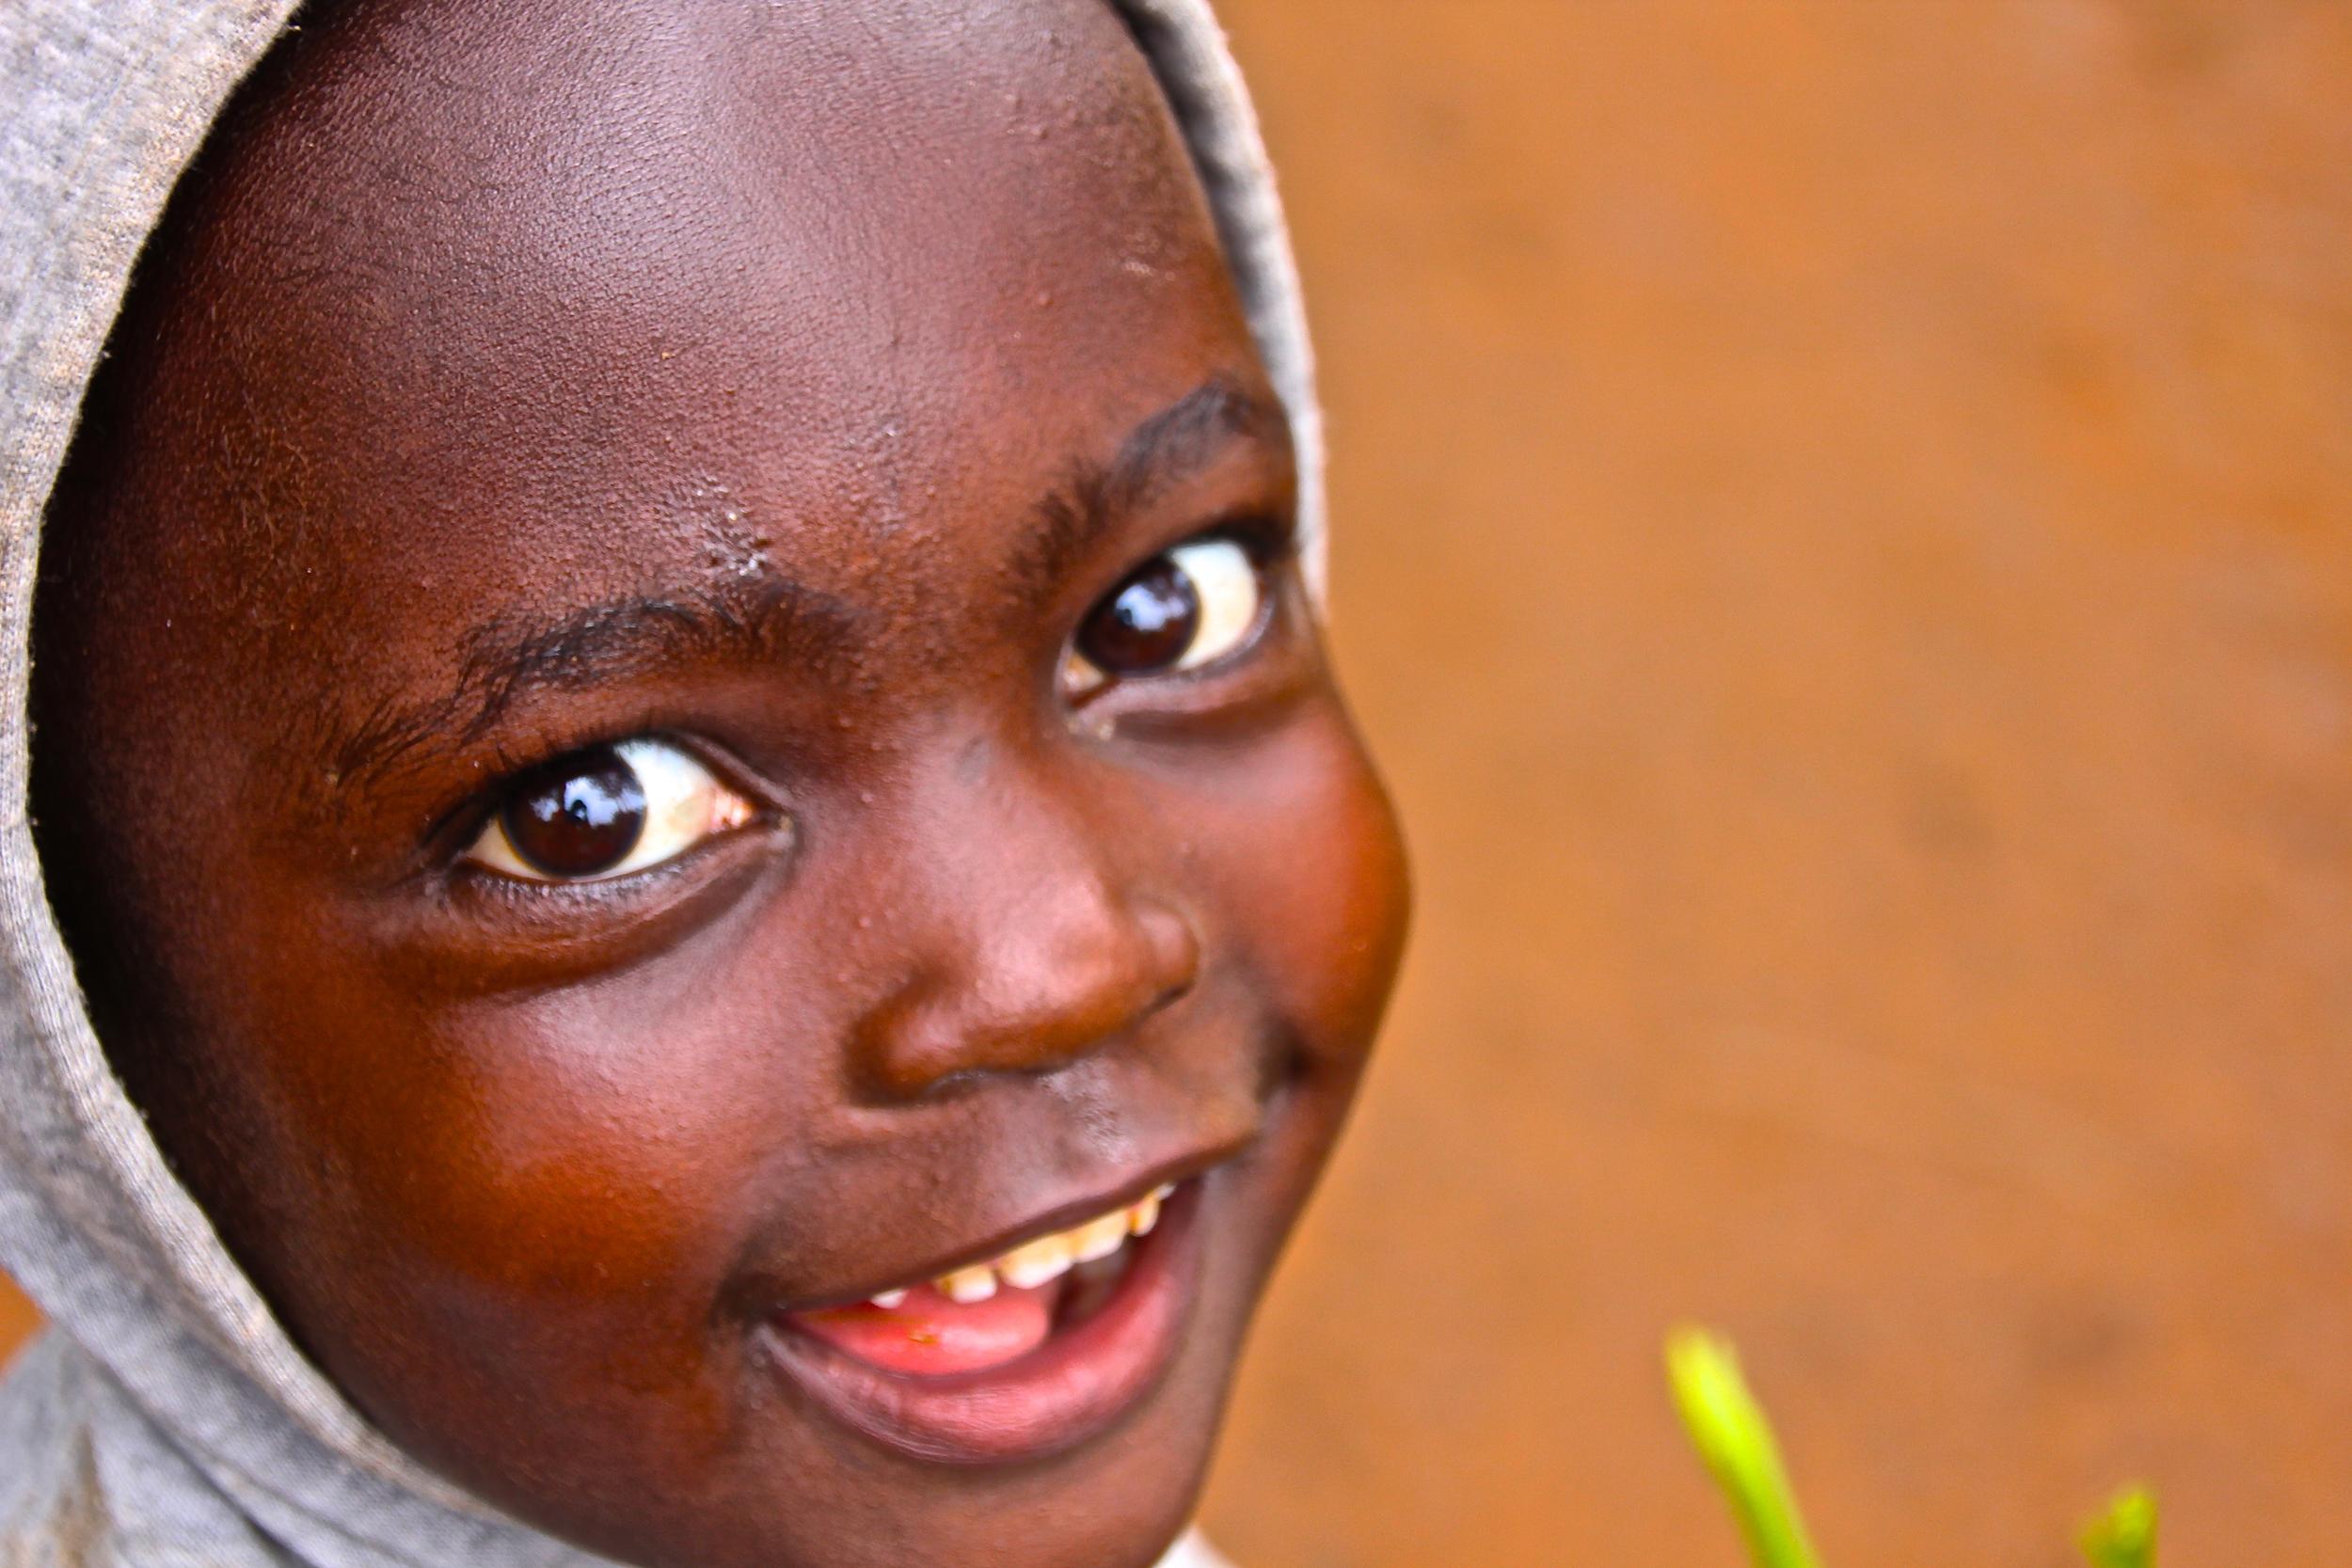 uganda-child-new-nature-foundation.jpg